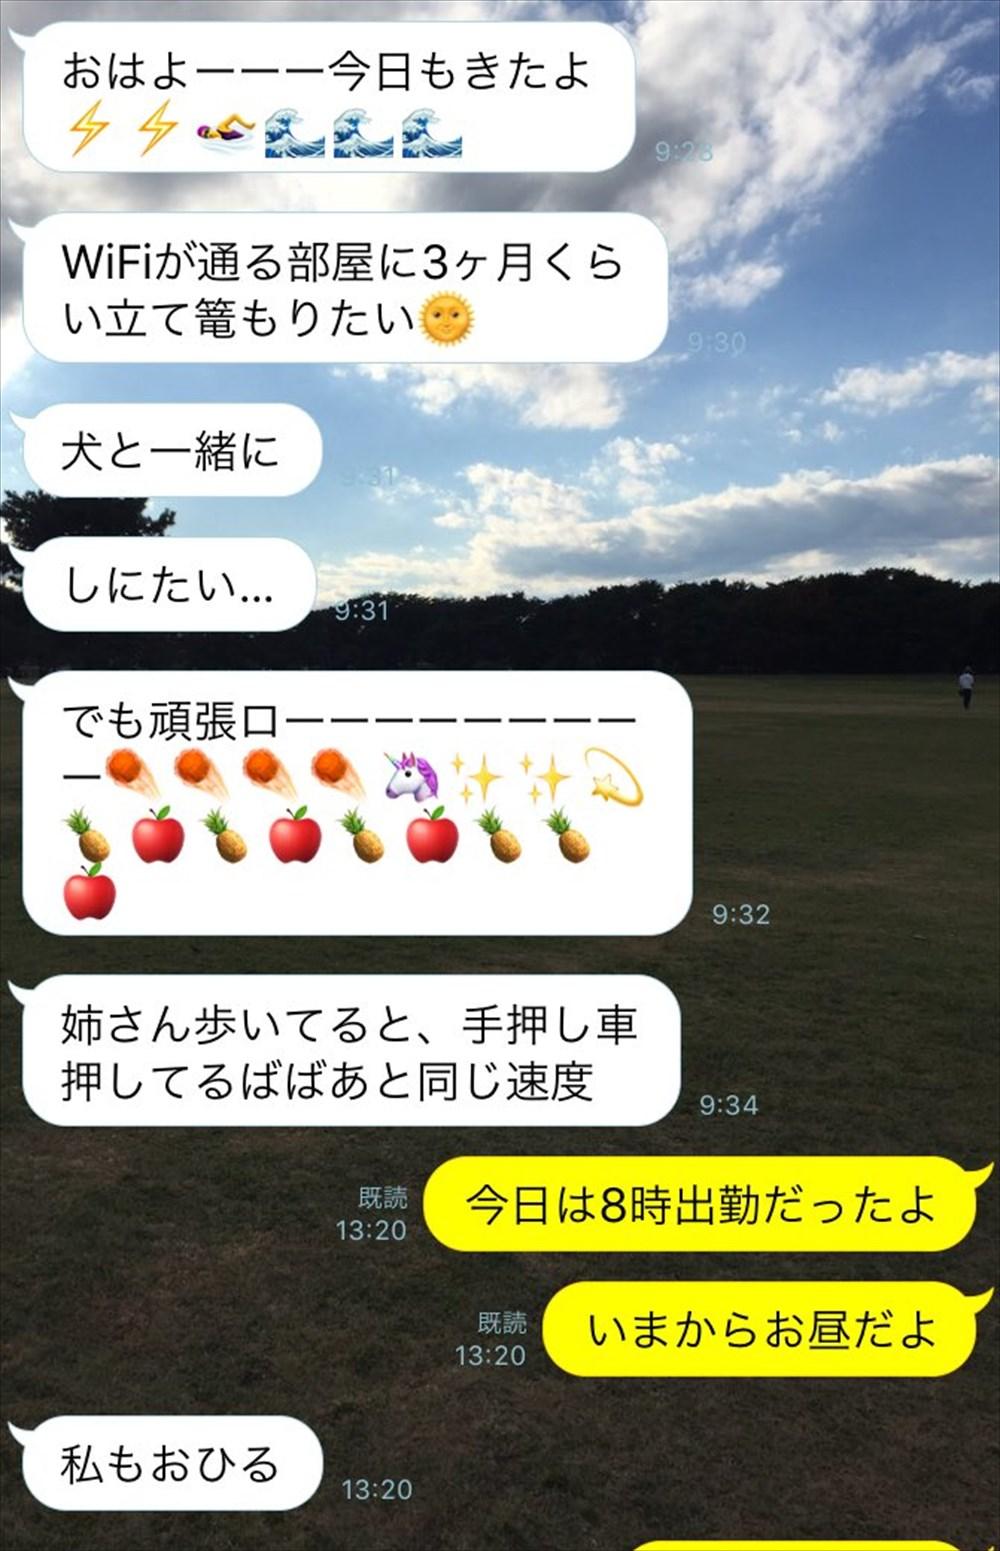 C_OkcjAUMAAiXAI_R